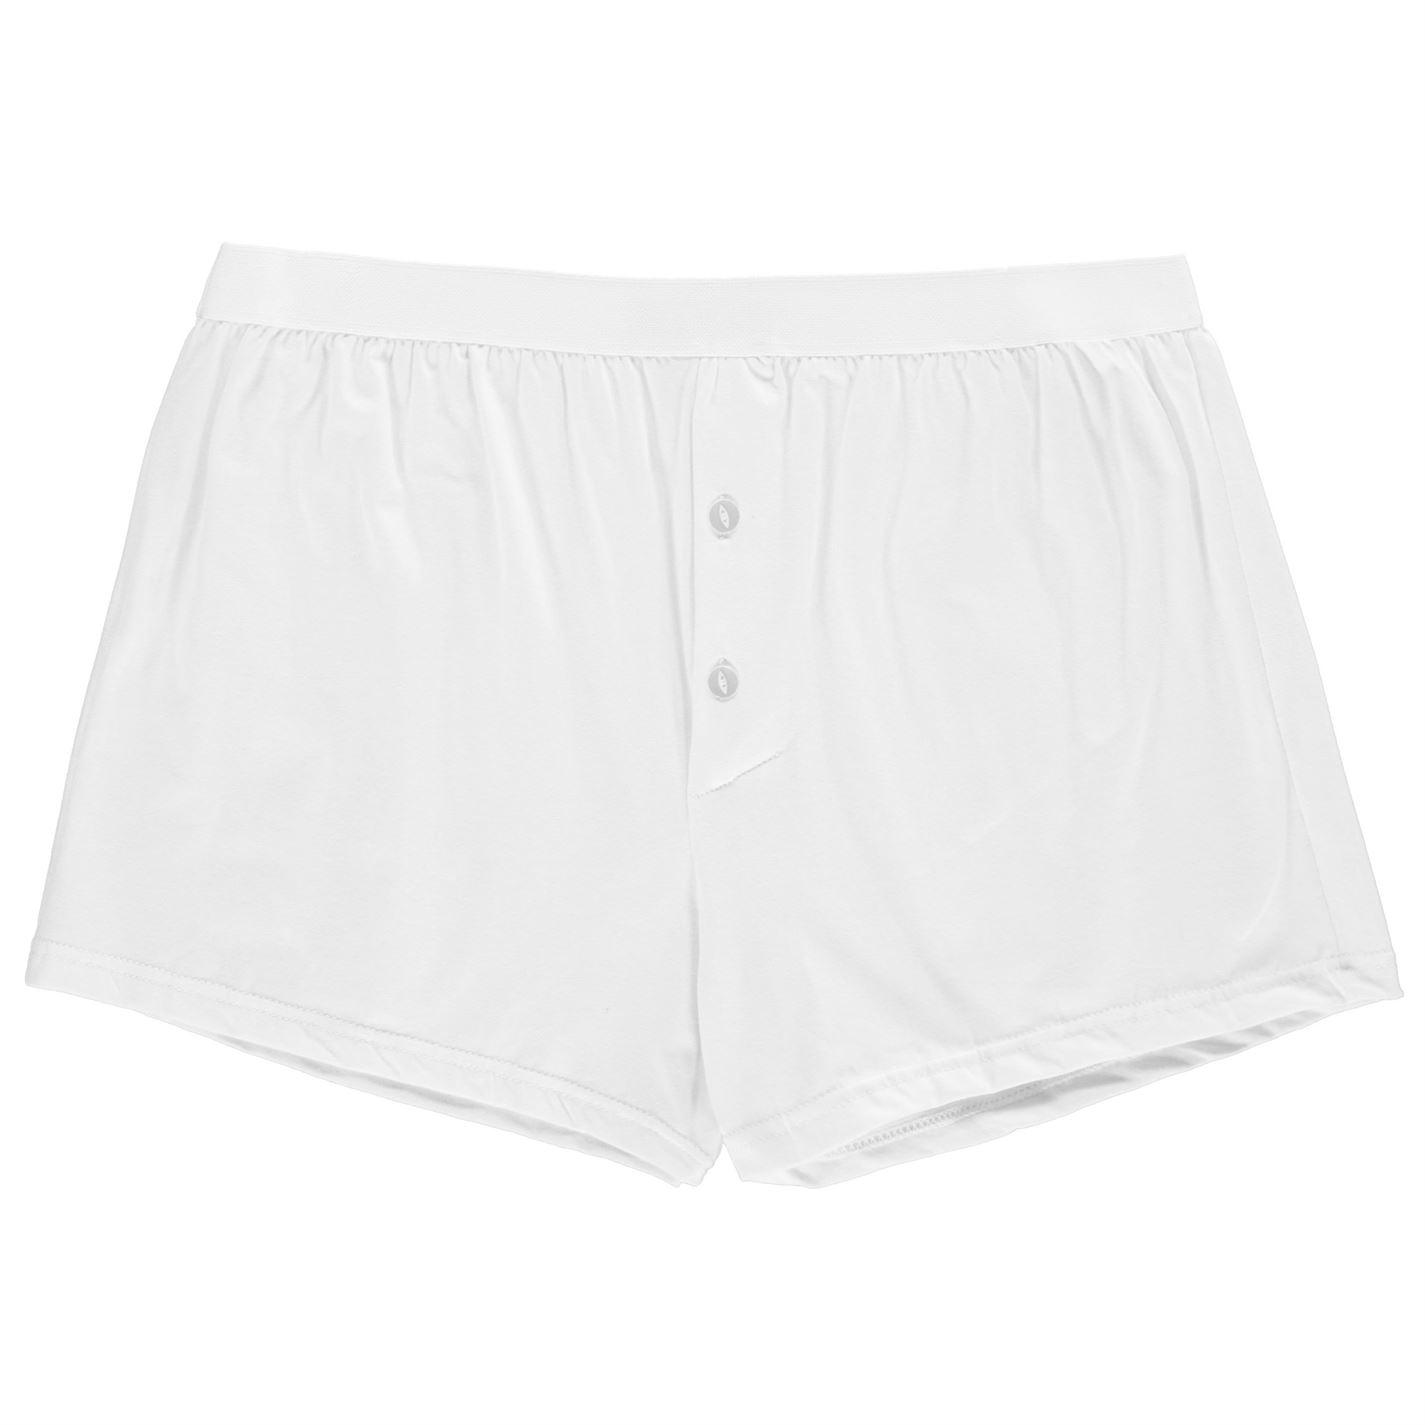 Juicy Jersey Boxer Shorts Mens